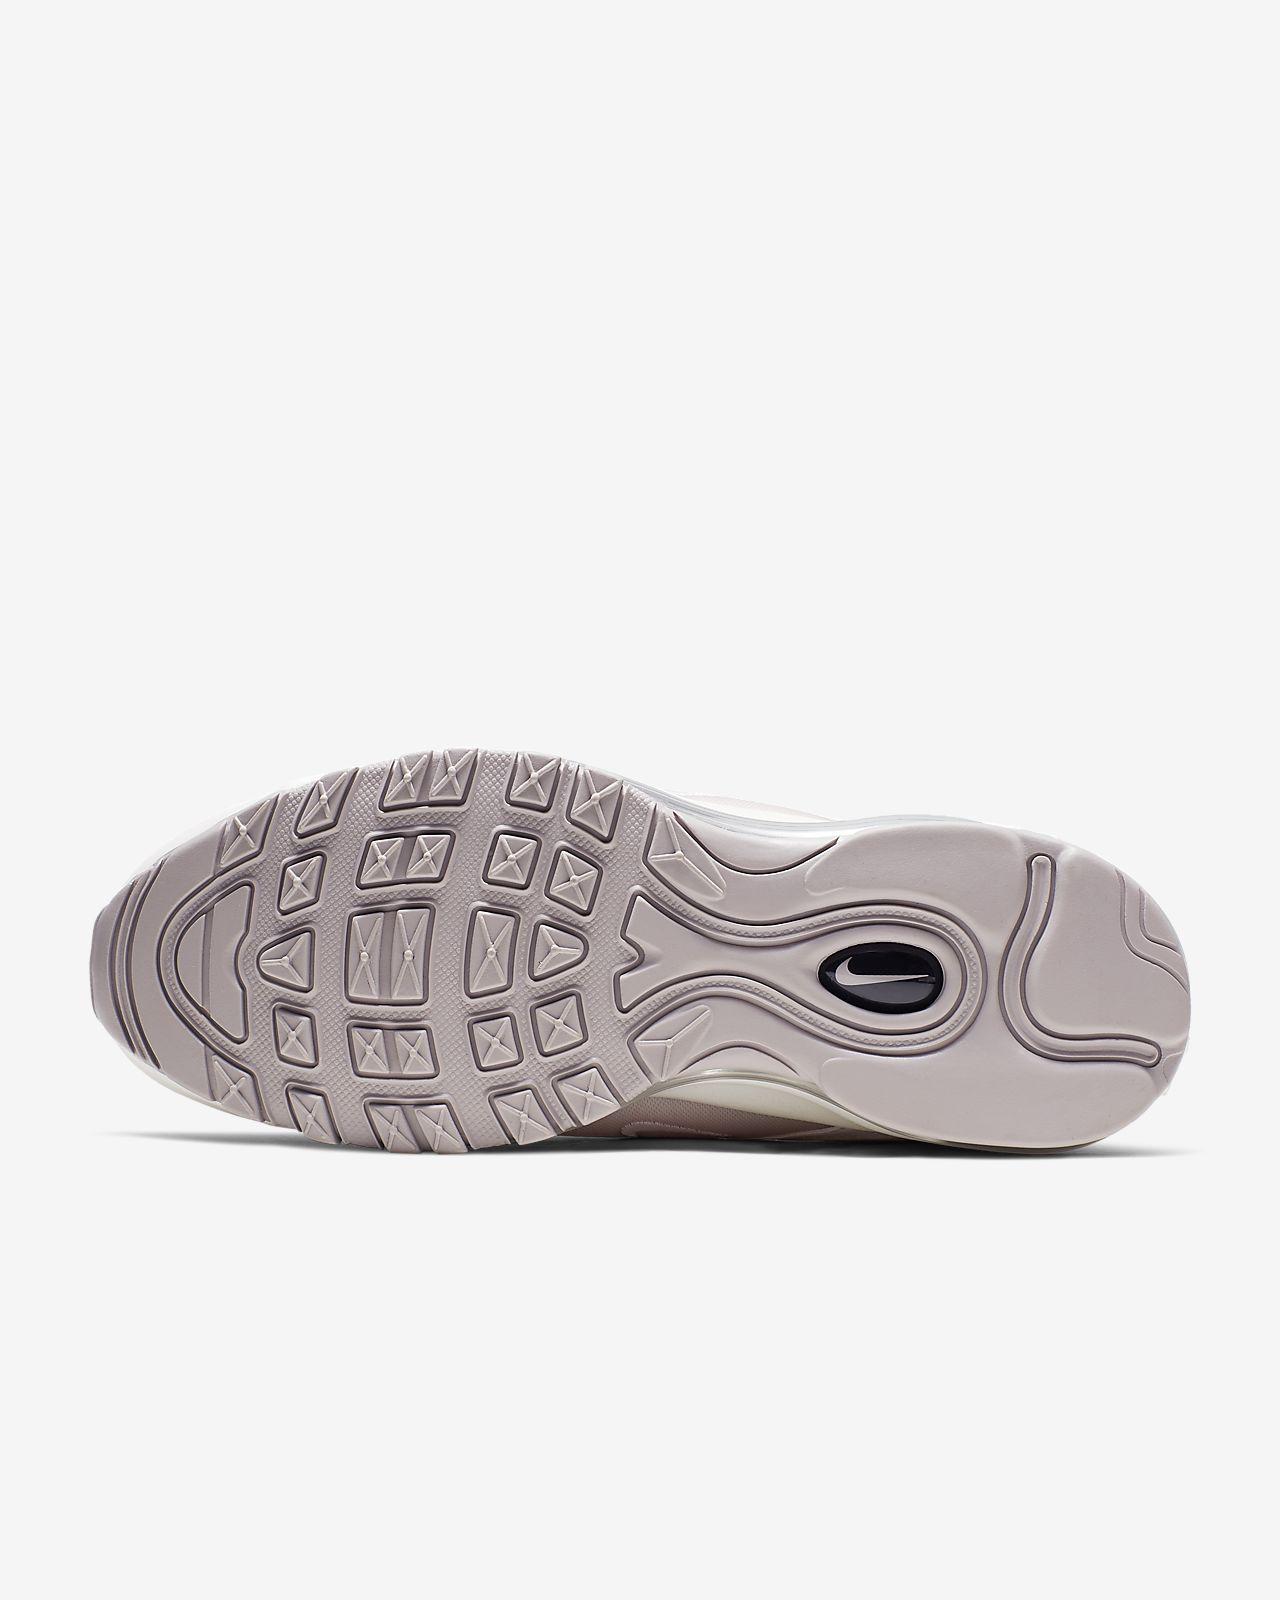 a5706b0d Calzado para mujer Nike Air Max 97. Nike.com MX